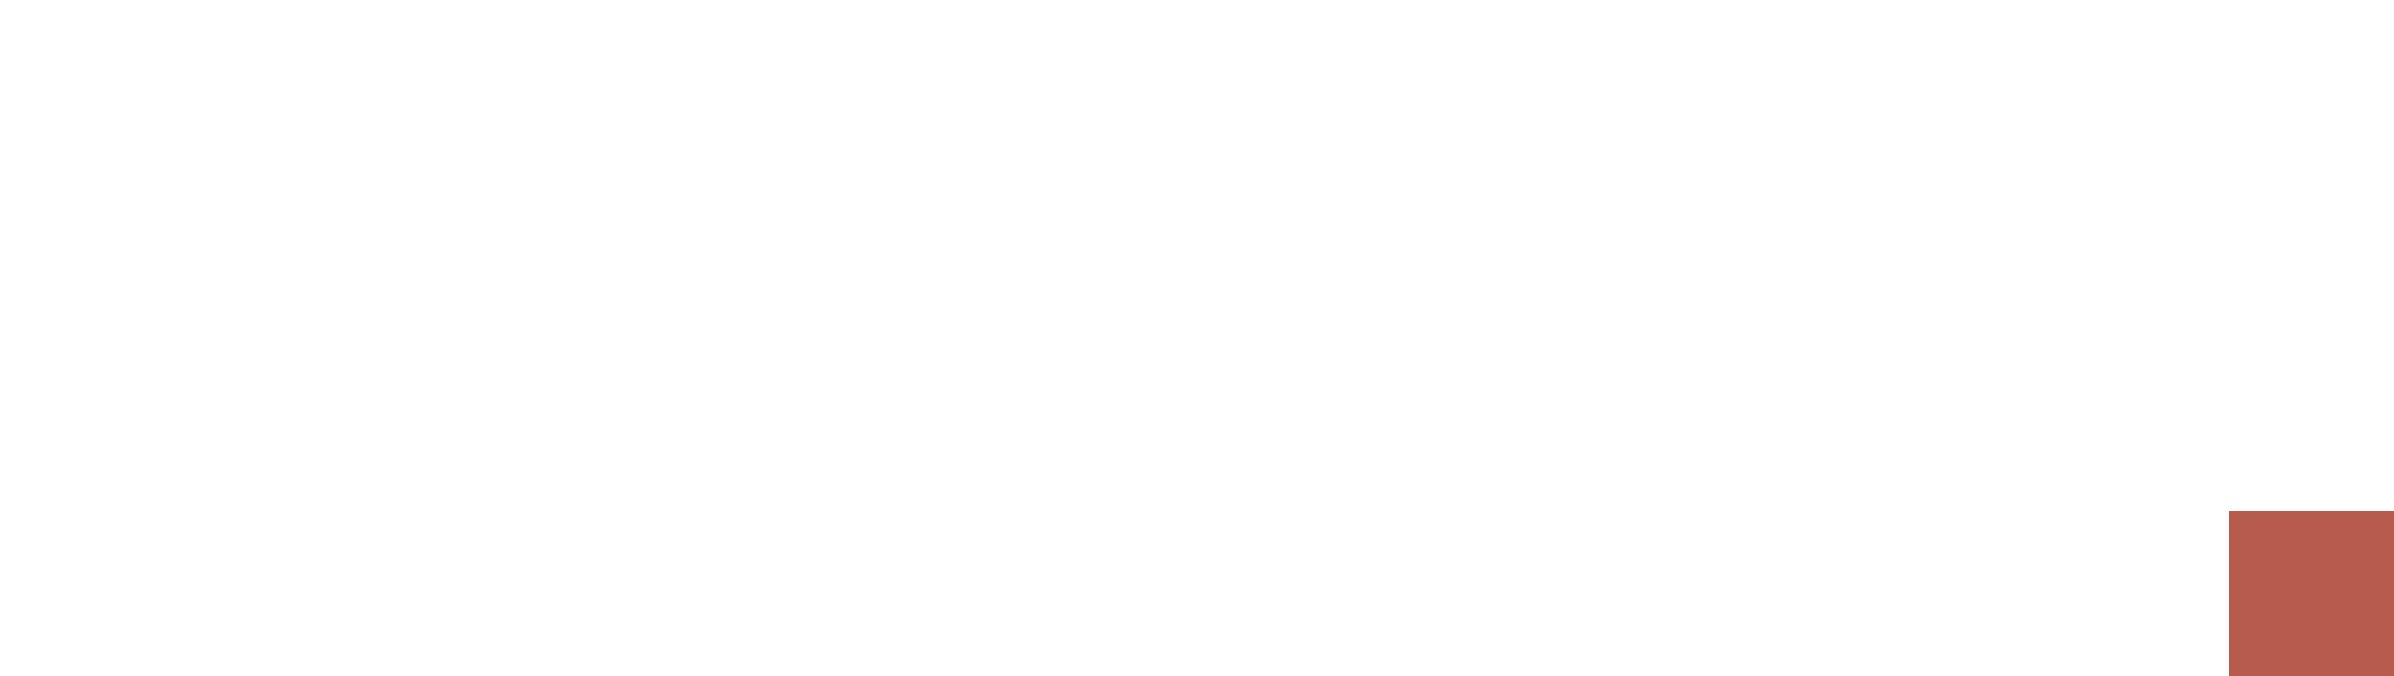 wrf-wohnraumfreiburg